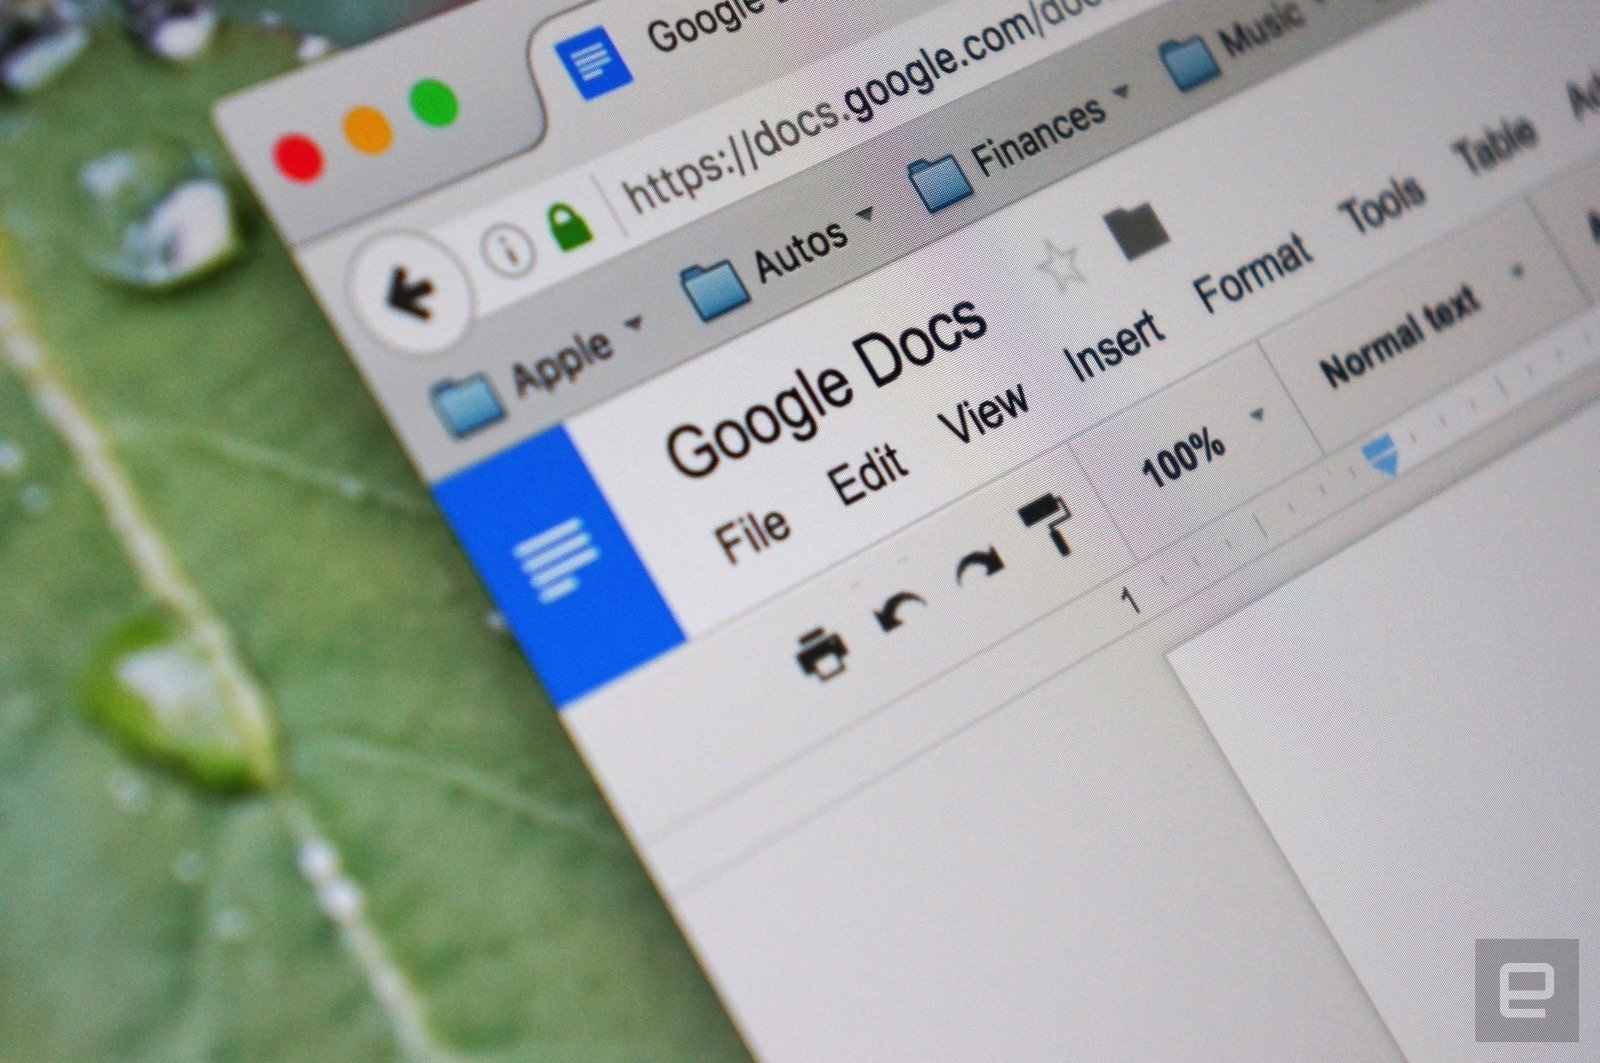 Google Docs uses AI to catch your grammar mistakes | DeviceDaily.com